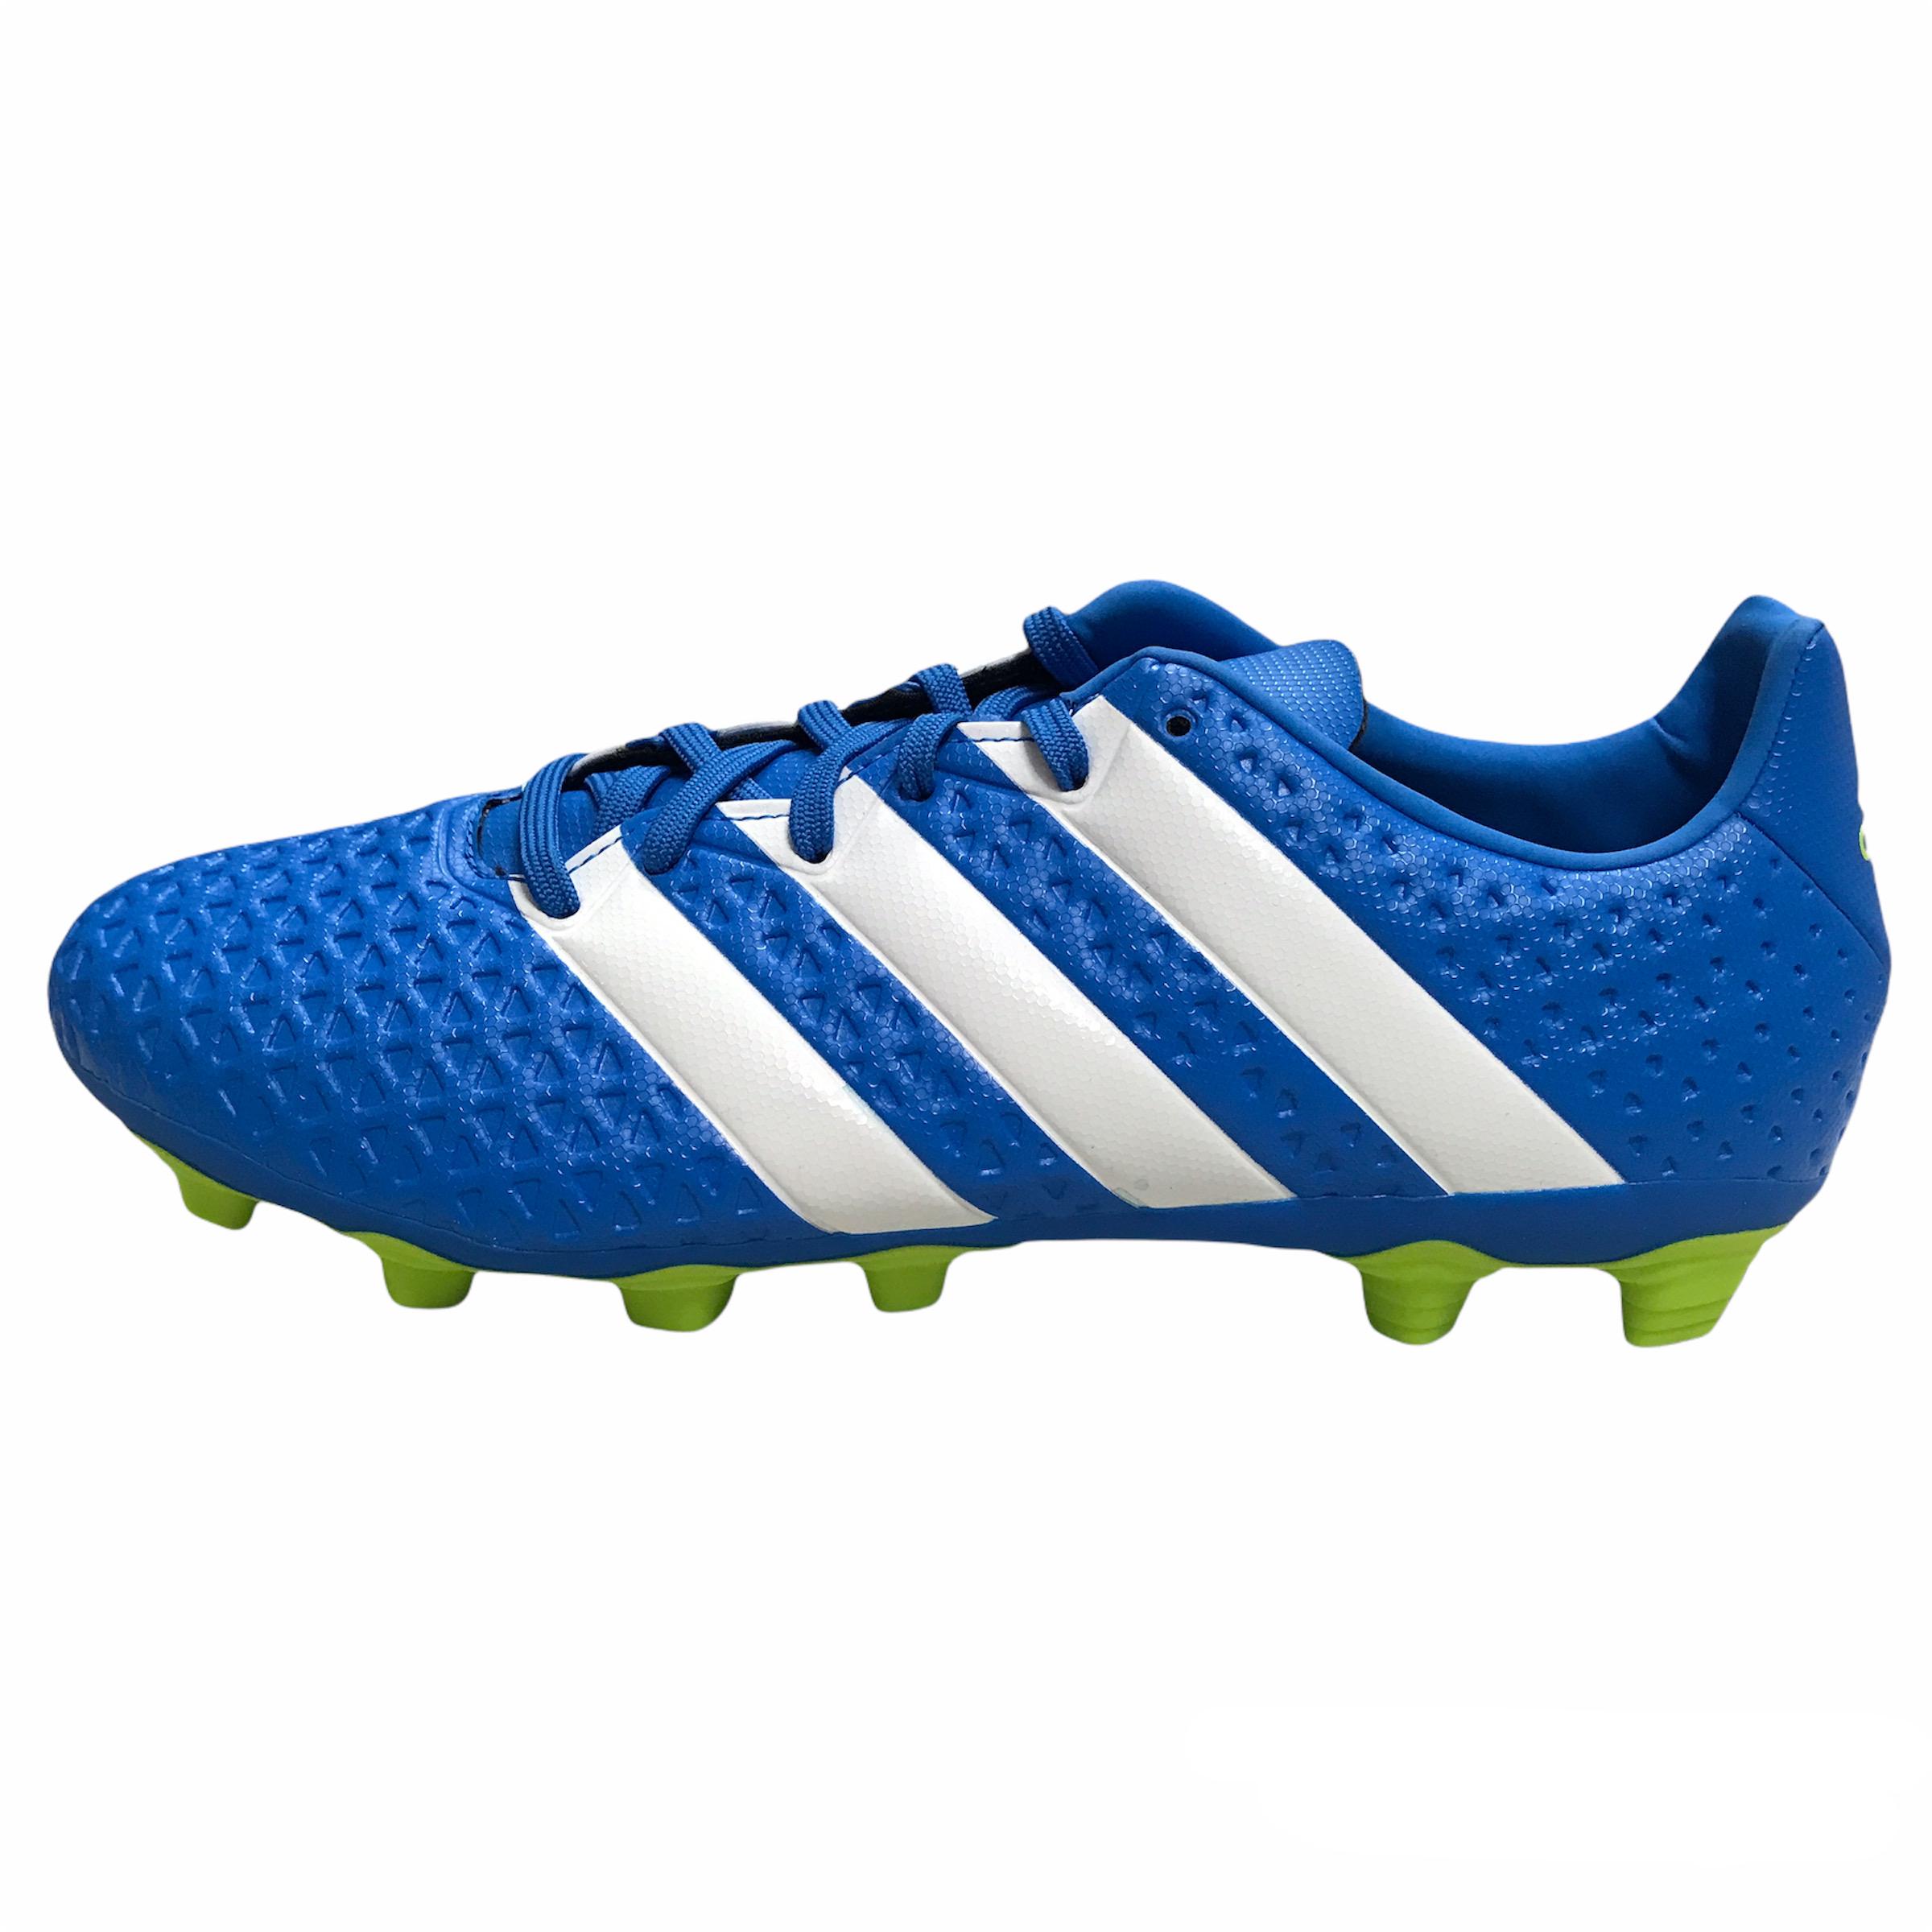 کفش فوتبال مردانه آدیداس مدل ads